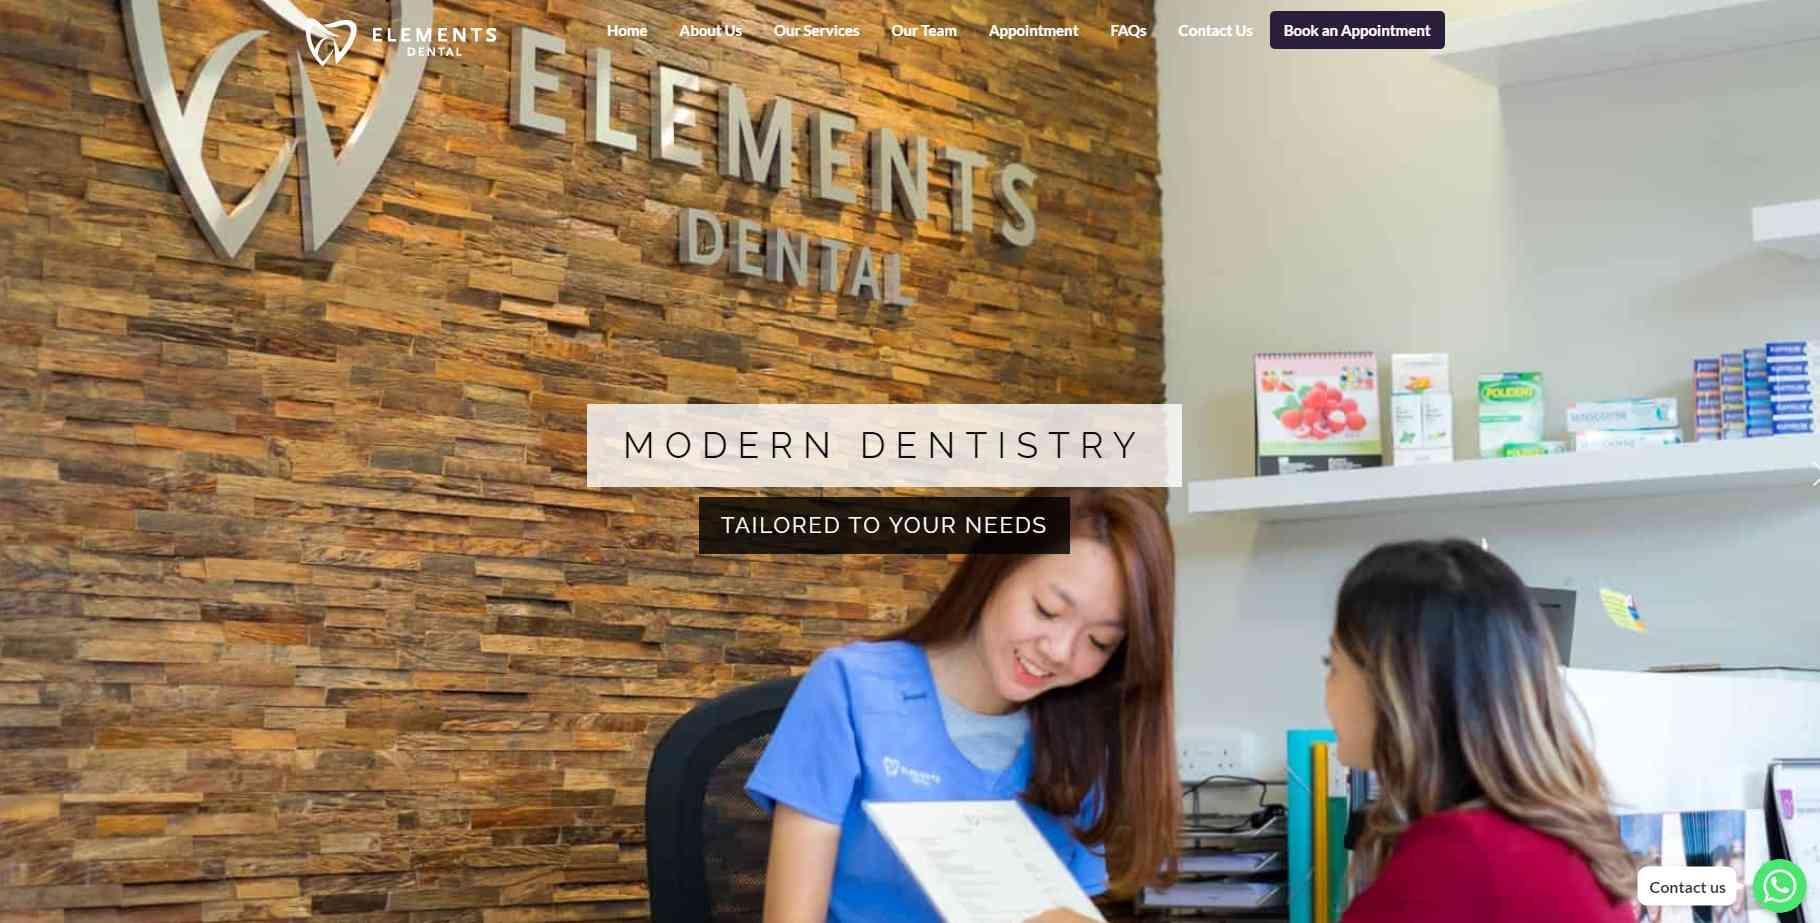 elemental Top Teeth Whitening In Singapore